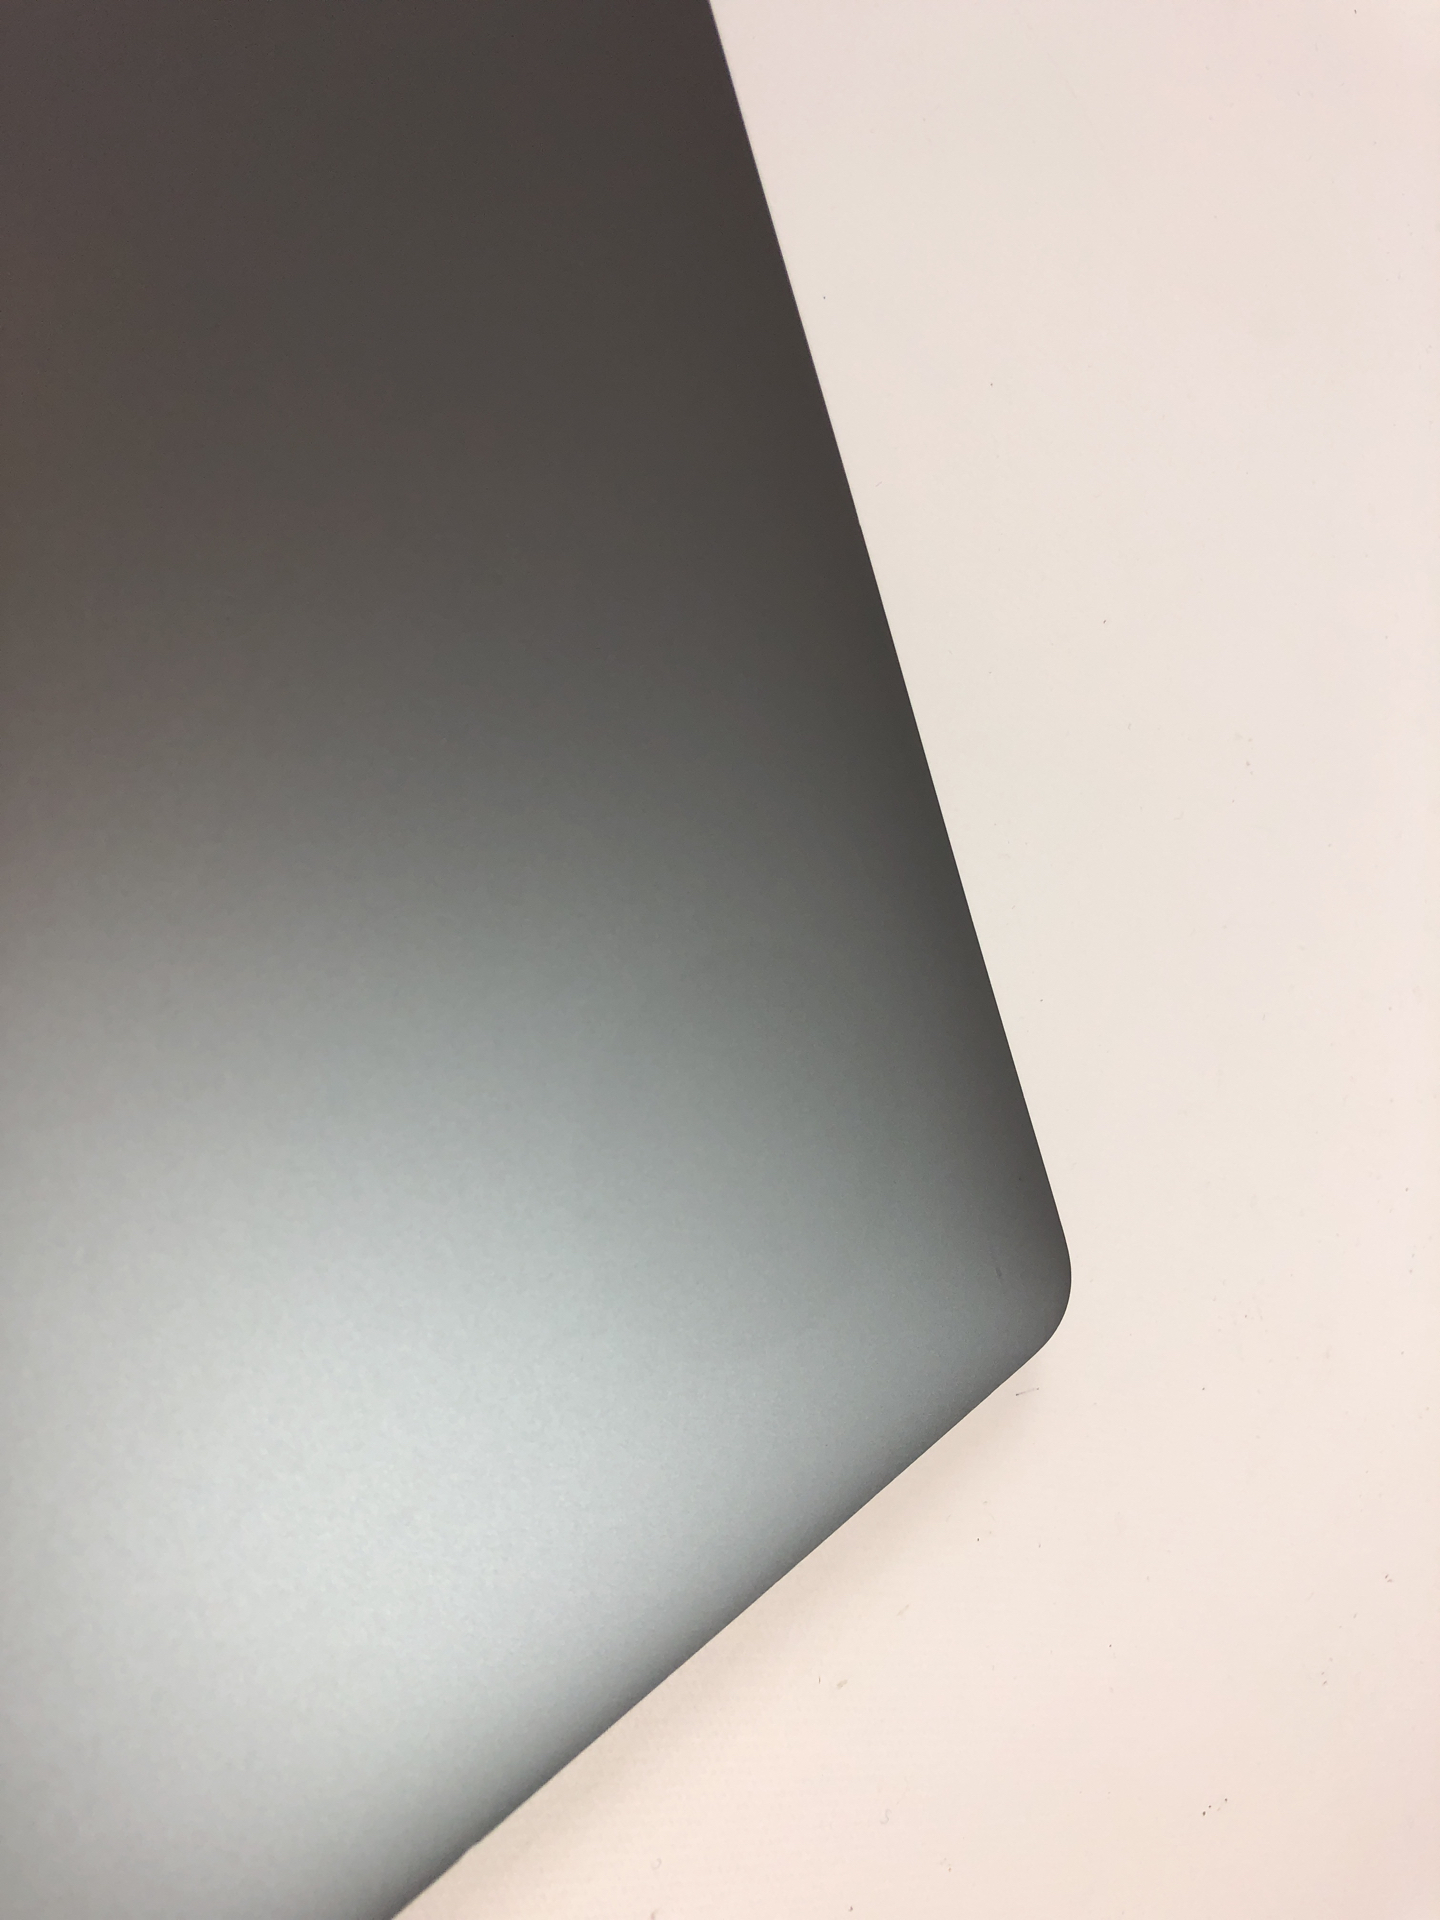 "MacBook Pro 15"" Touch Bar Late 2016 (Intel Quad-Core i7 2.6 GHz 16 GB RAM 512 GB SSD), Space Gray, Intel Quad-Core i7 2.6 GHz, 16 GB RAM, 512 GB SSD, Kuva 3"